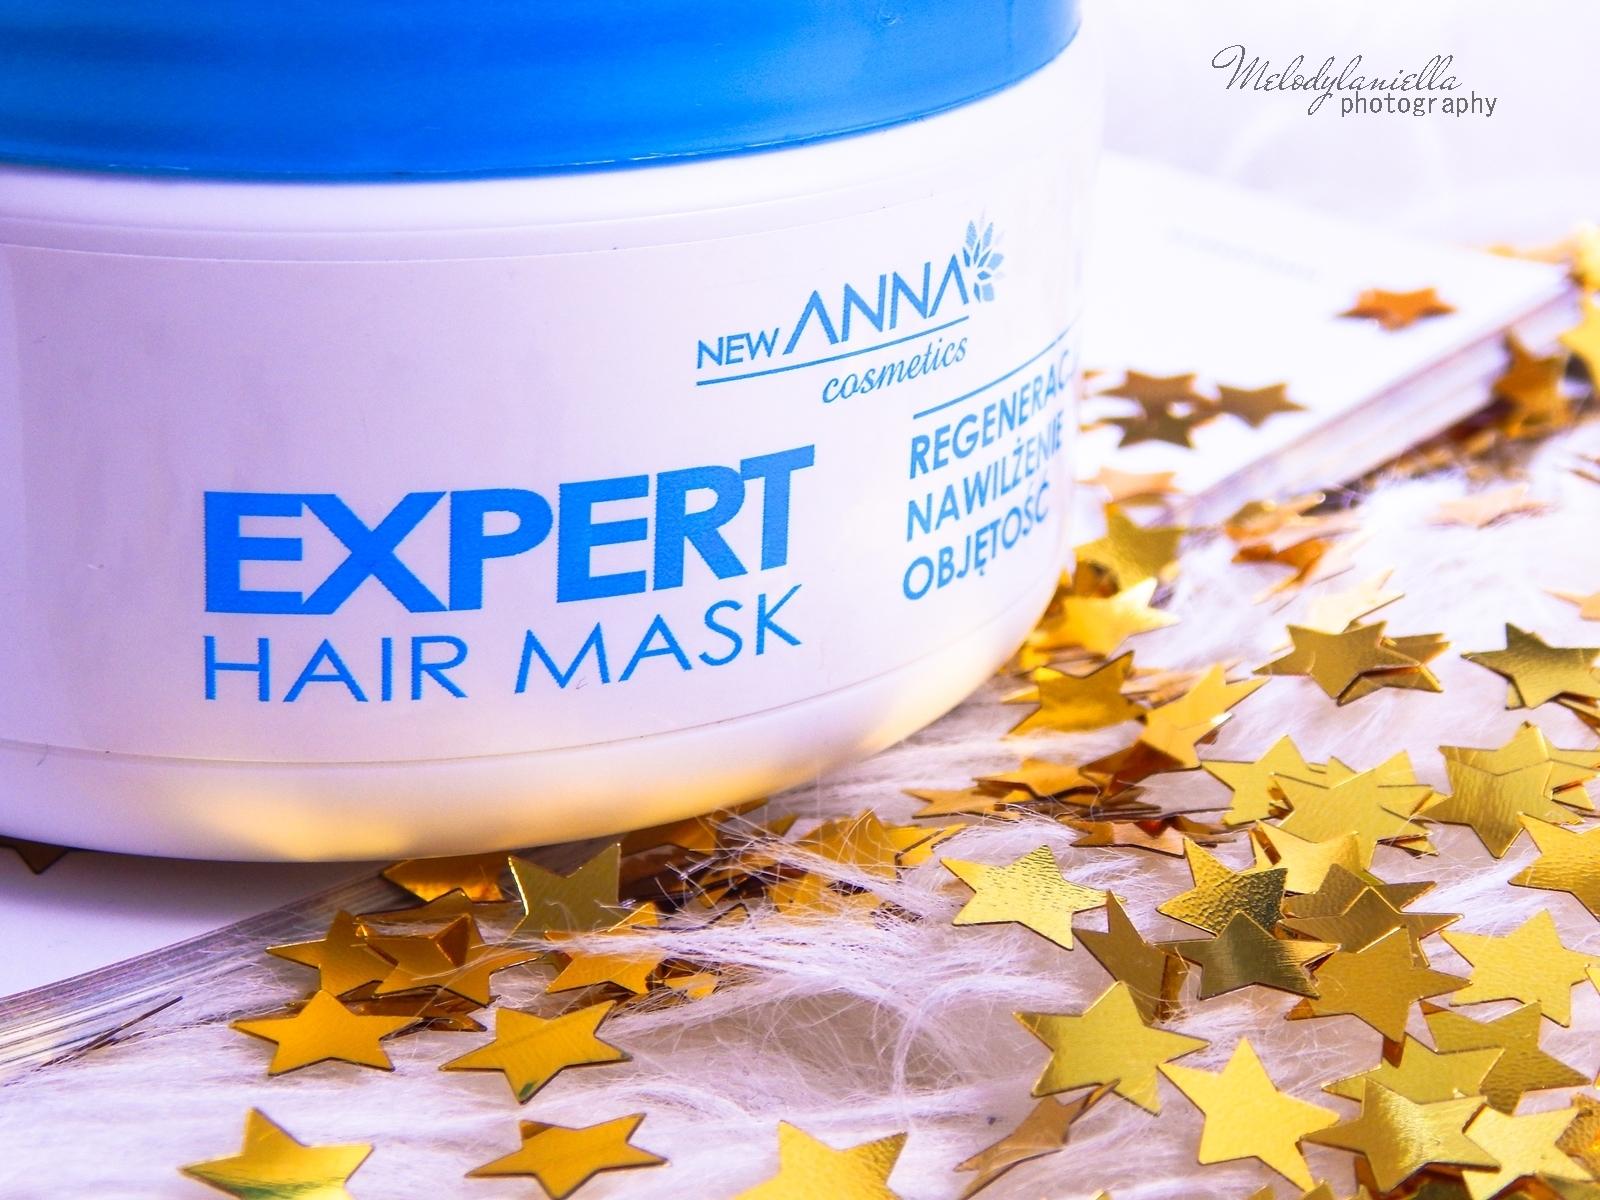 5 new anna cosmetics hair mask expert maska do włosów new anna cosmetics recenzje kosmetyków blog beauty lifestyle fashion melodylaniella love fotografia-2